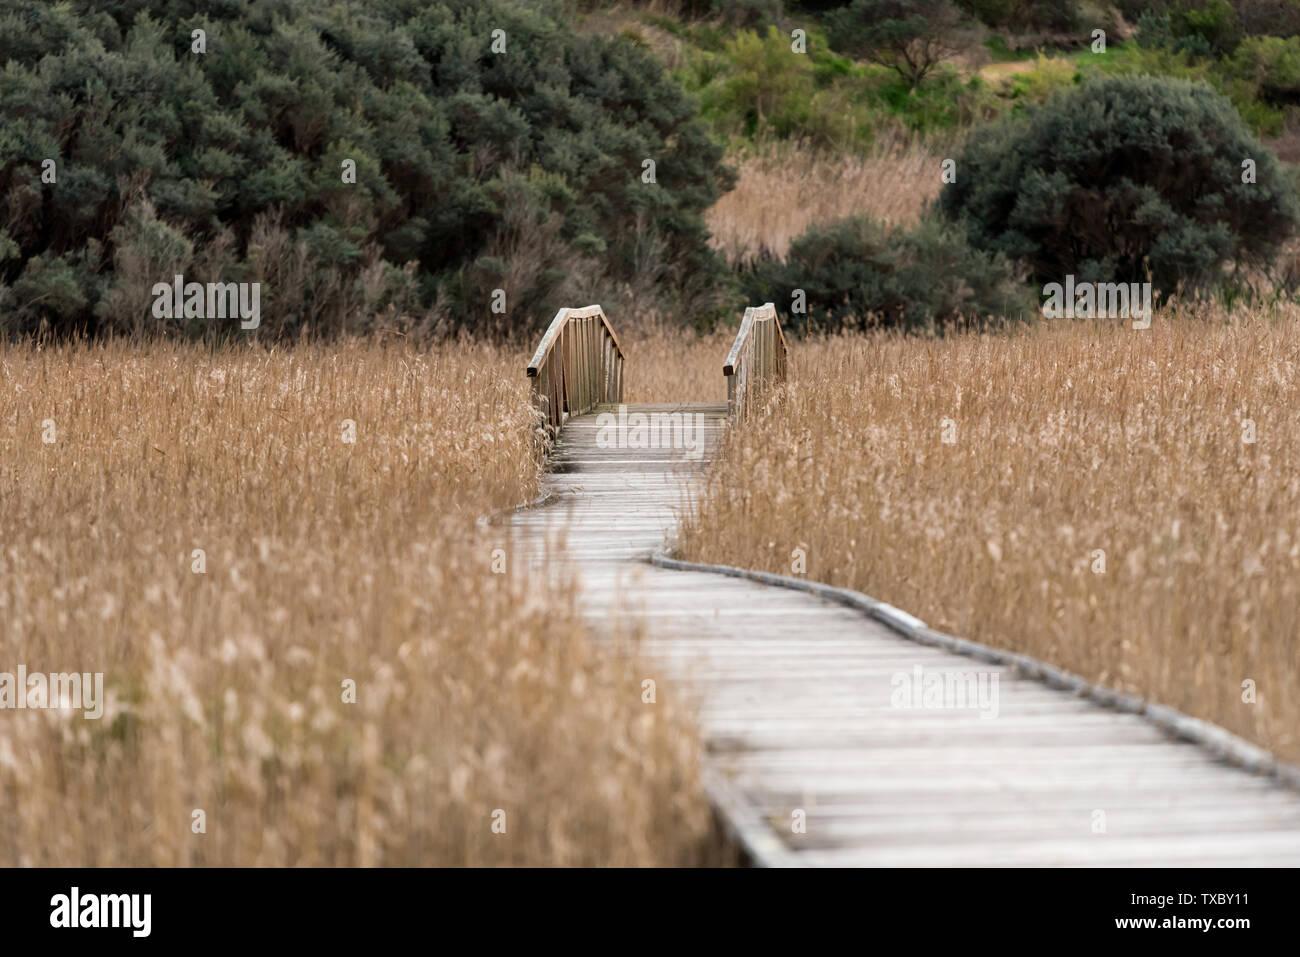 Wooden deck causeway bridge running through dry fields Stock Photo